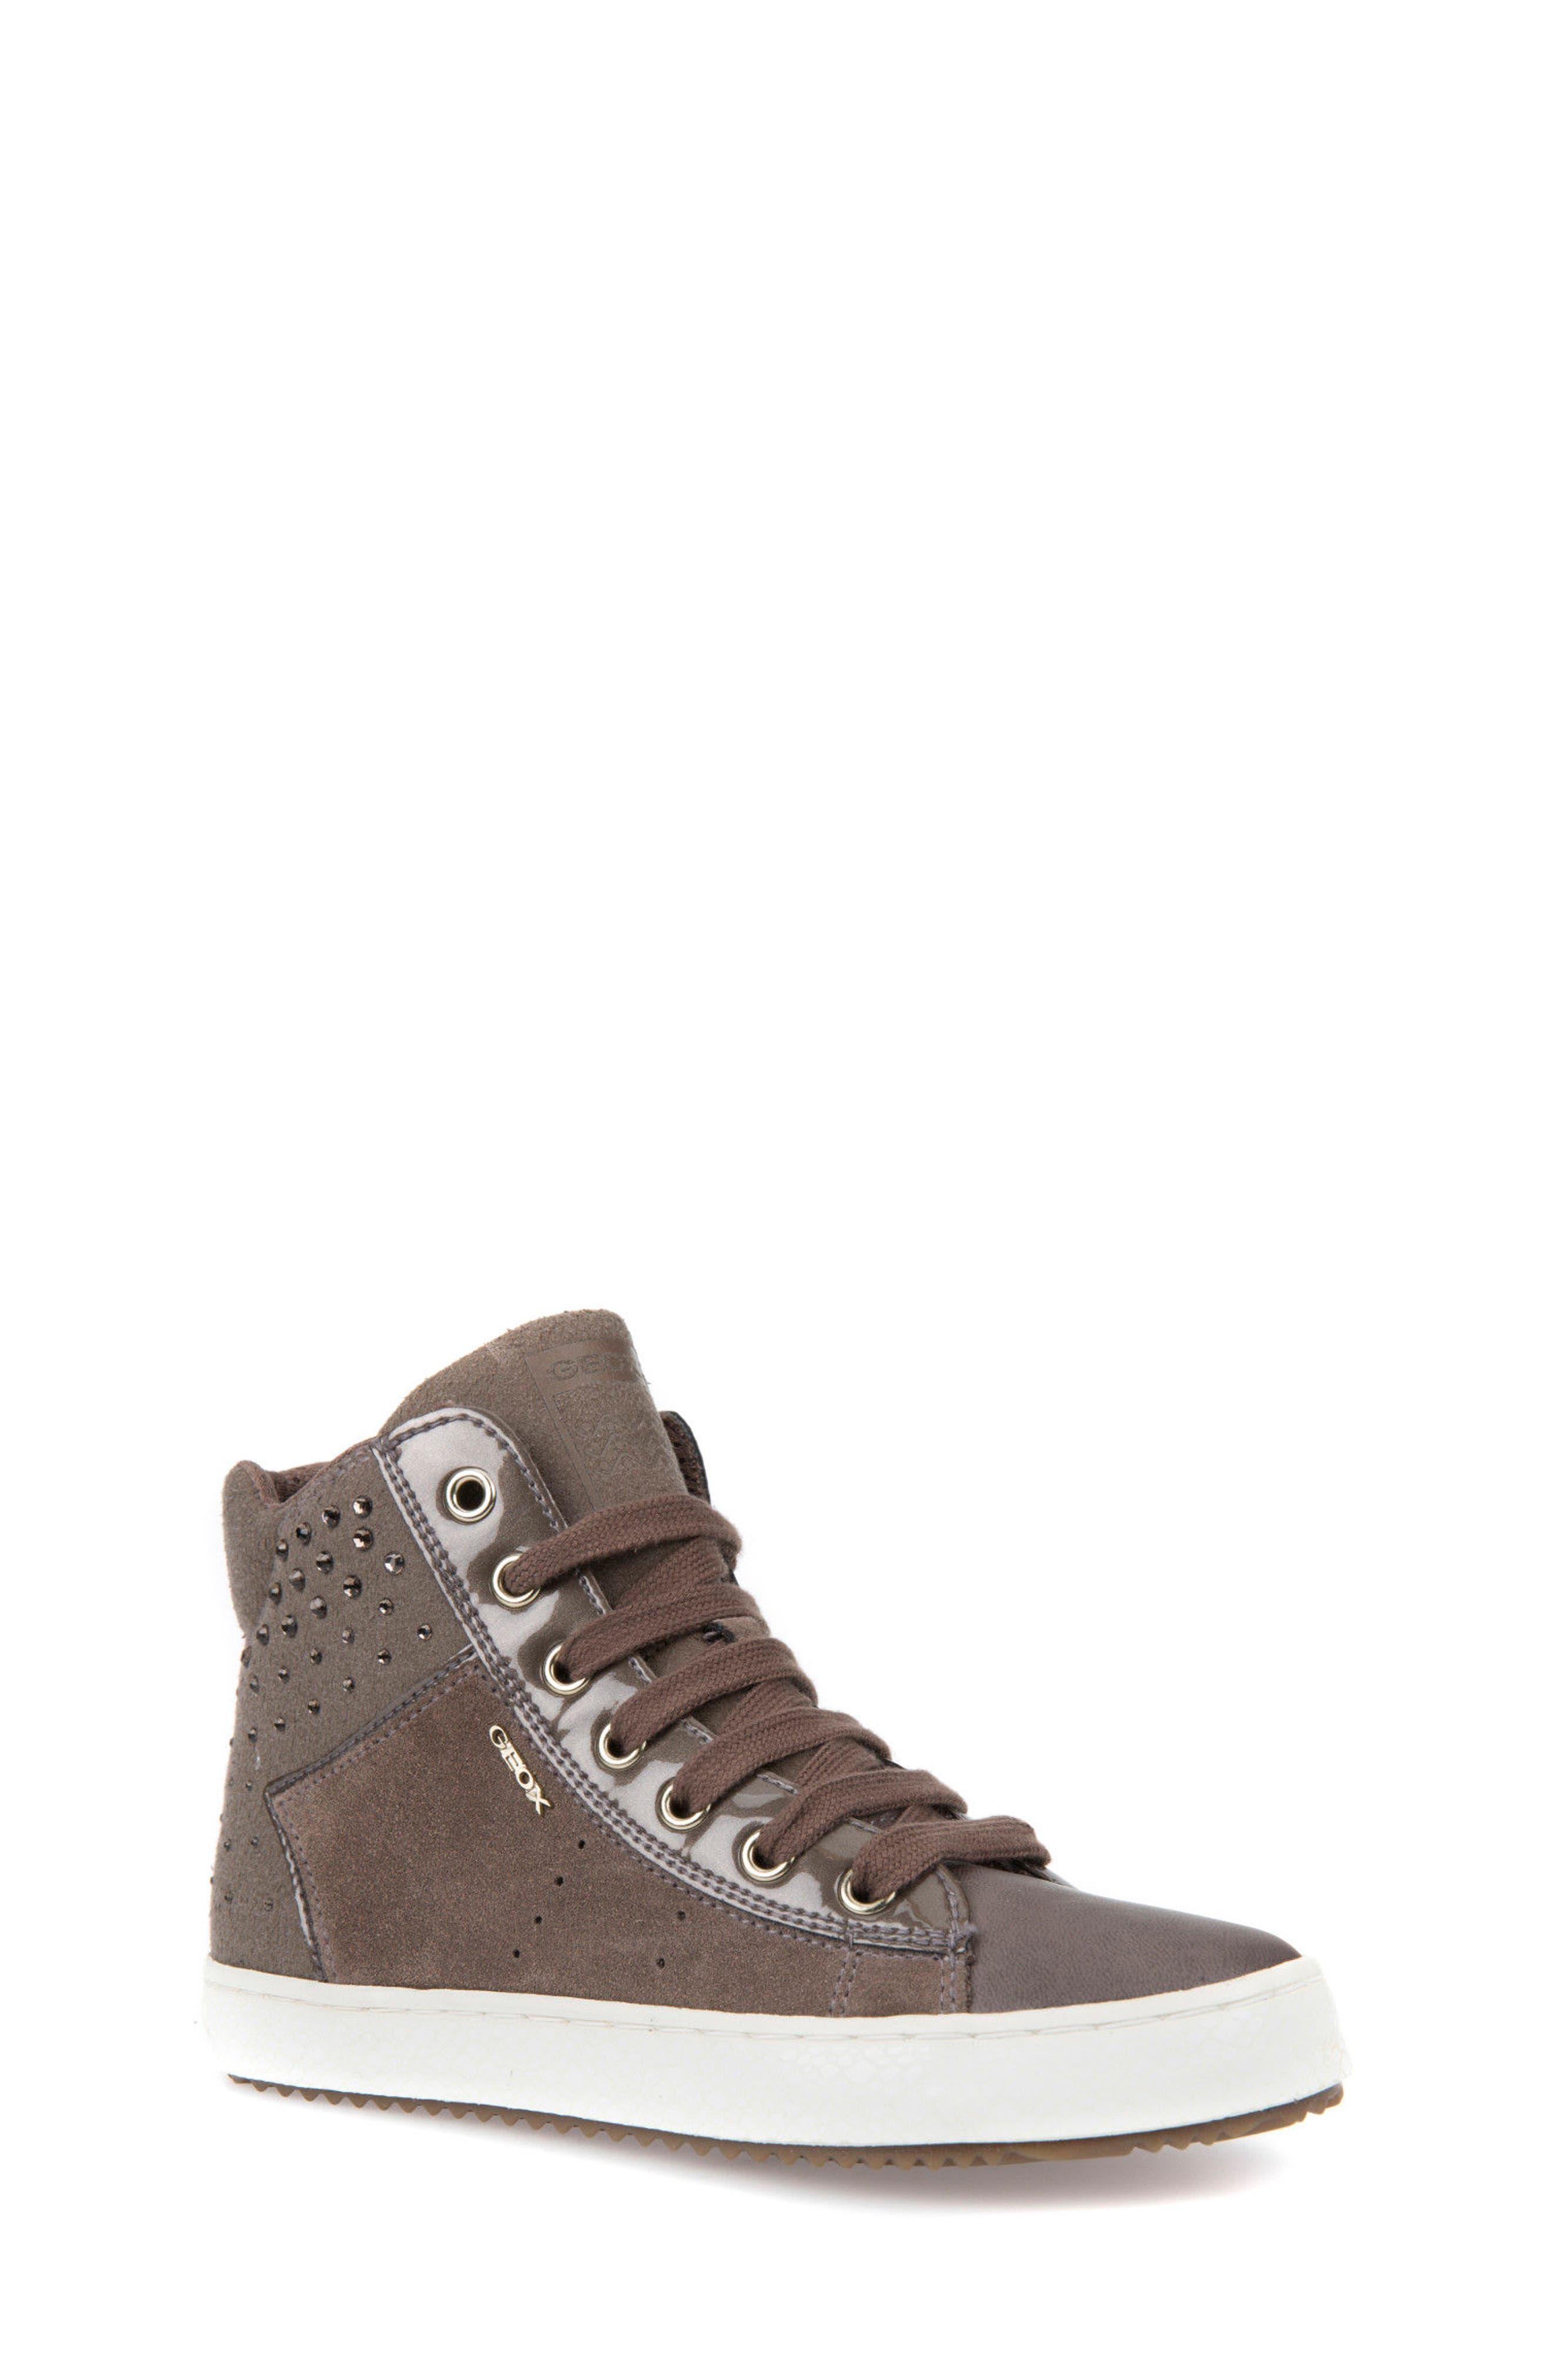 Kalispera Girl Embellished High Top Sneaker,                             Main thumbnail 1, color,                             Dark Beige